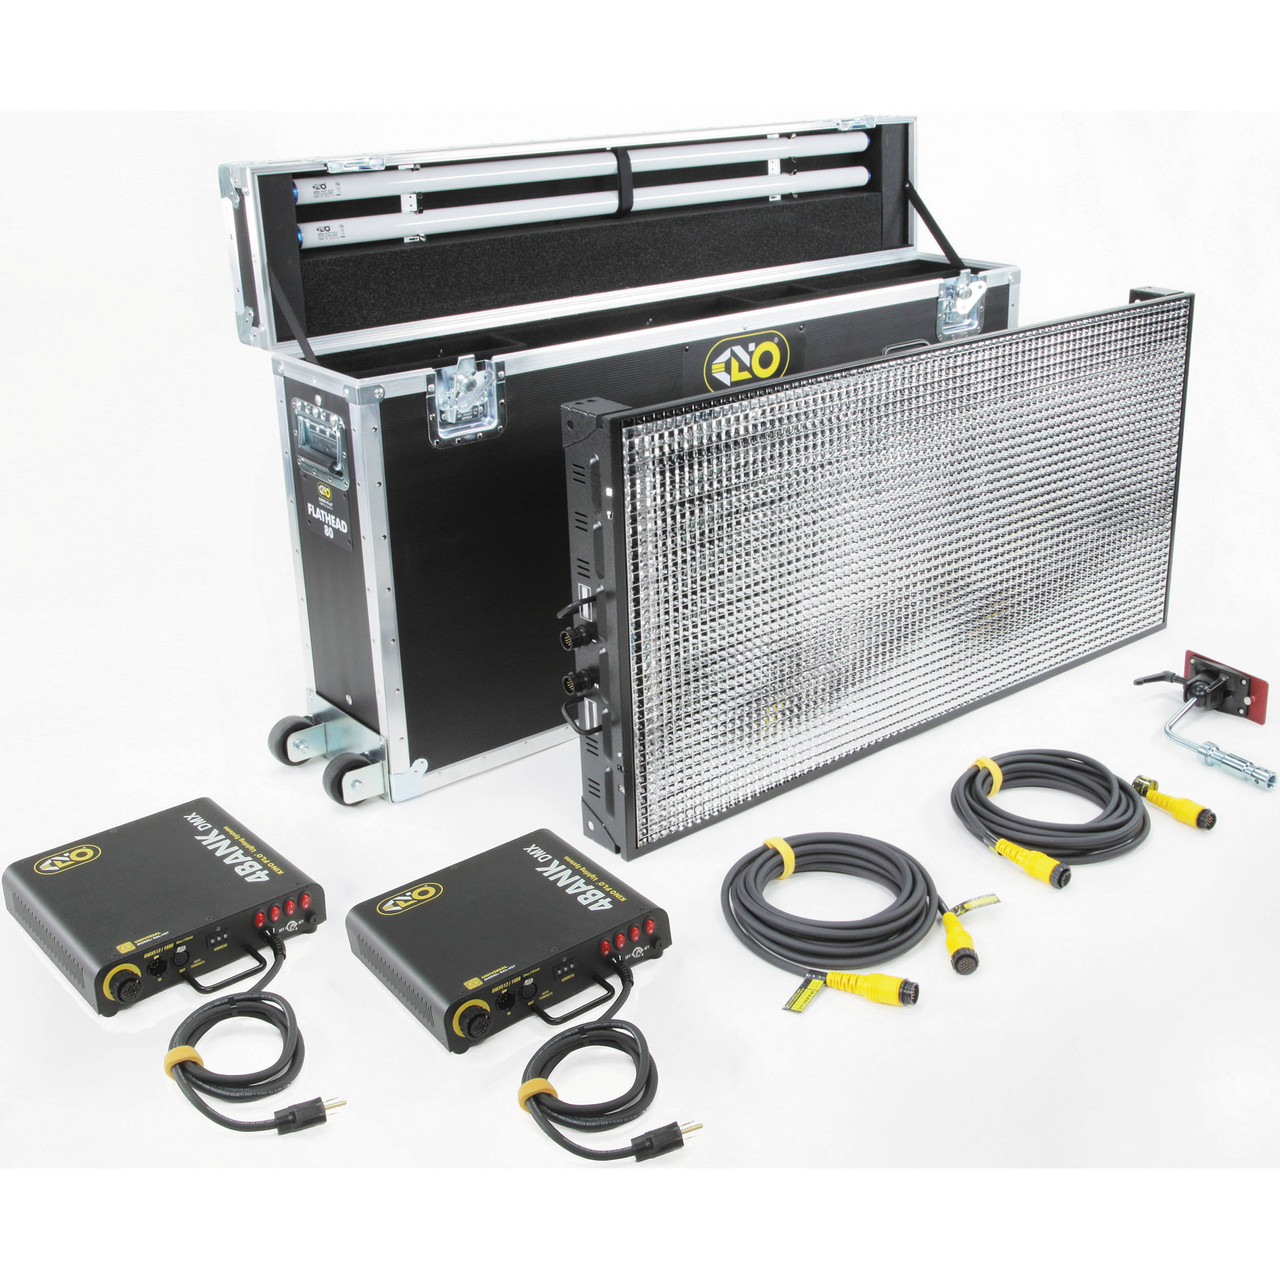 Kino Flo Flathead 80 DMX System Kit (North American Plug) (KIT-F80-X120U)